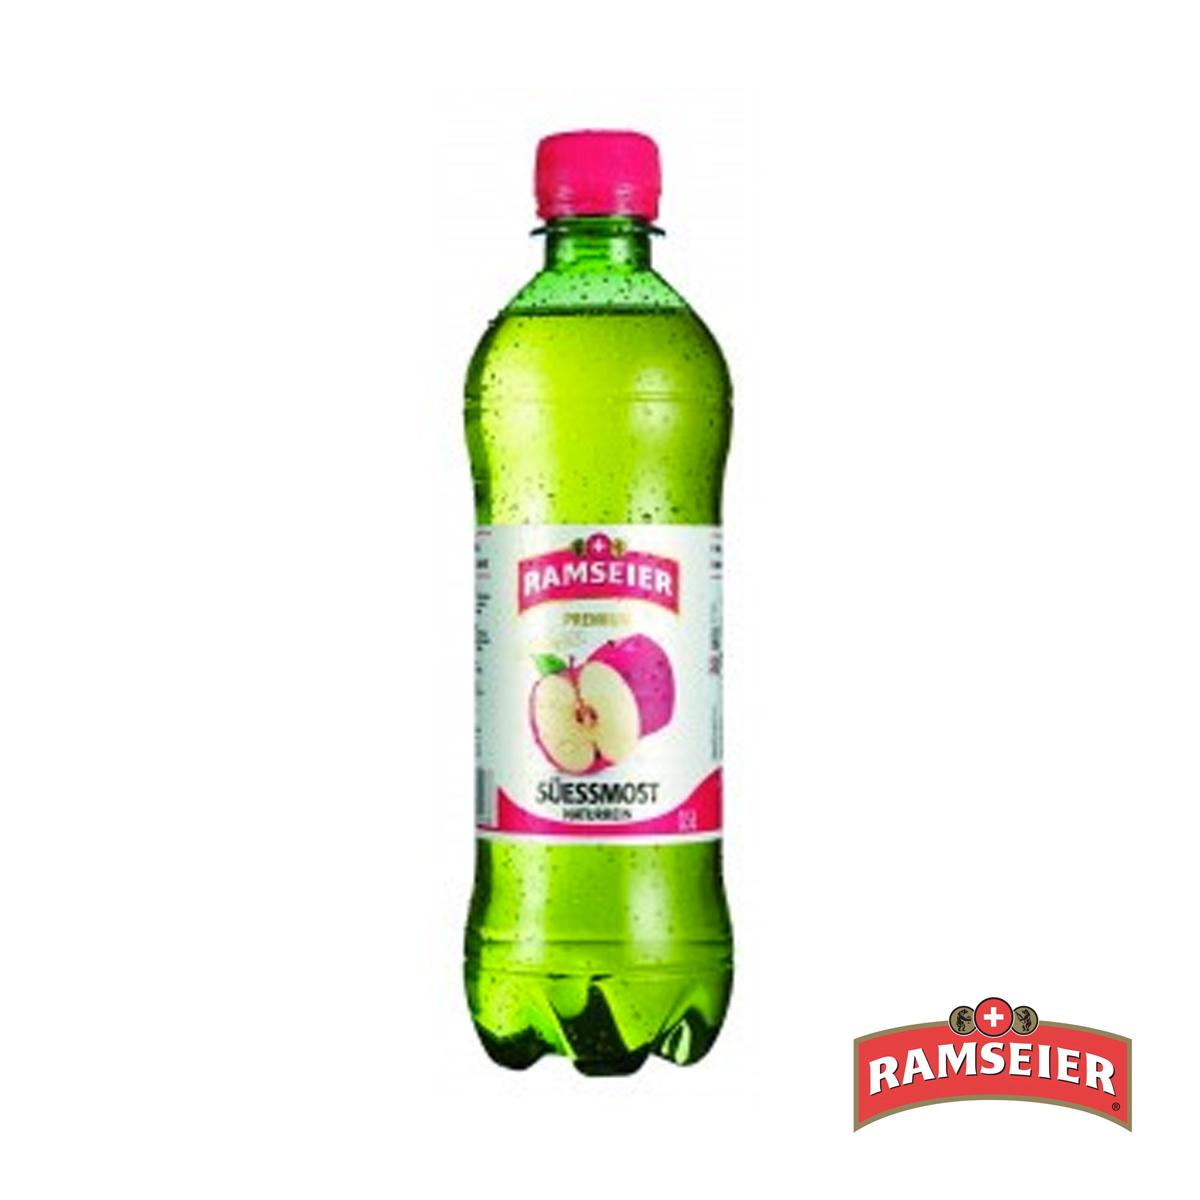 jus-de-pomme-RAMSEIER